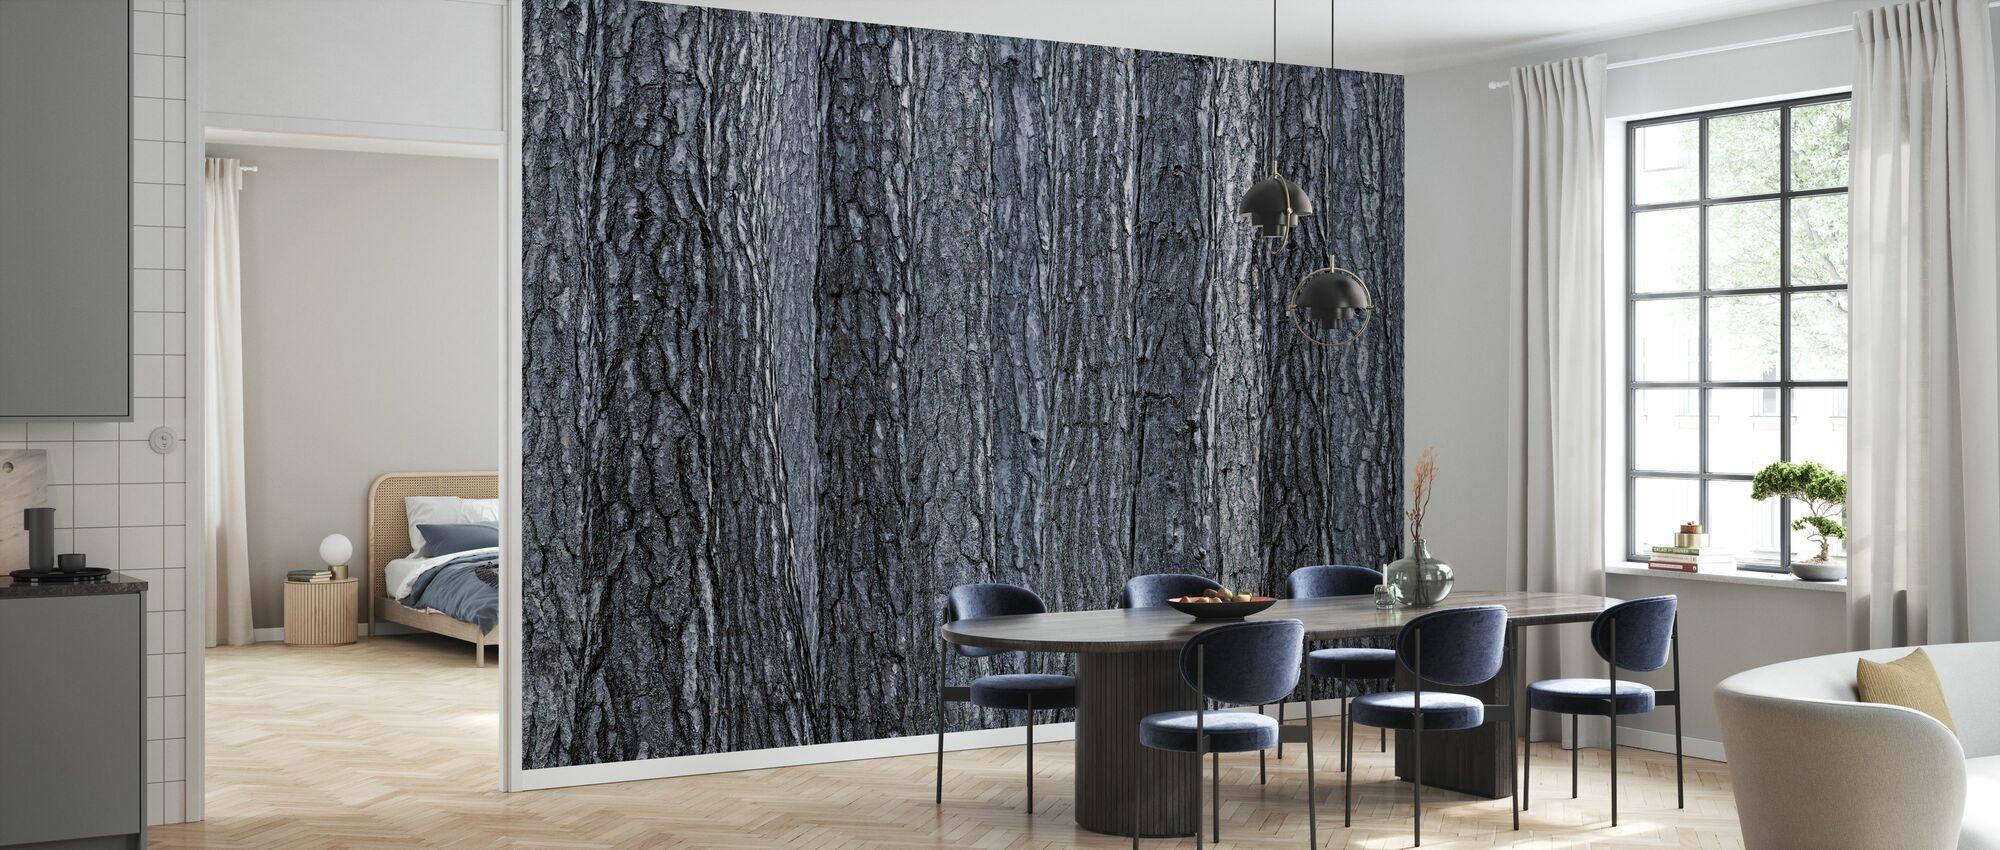 Black Blue Bark - Wallpaper - Kitchen